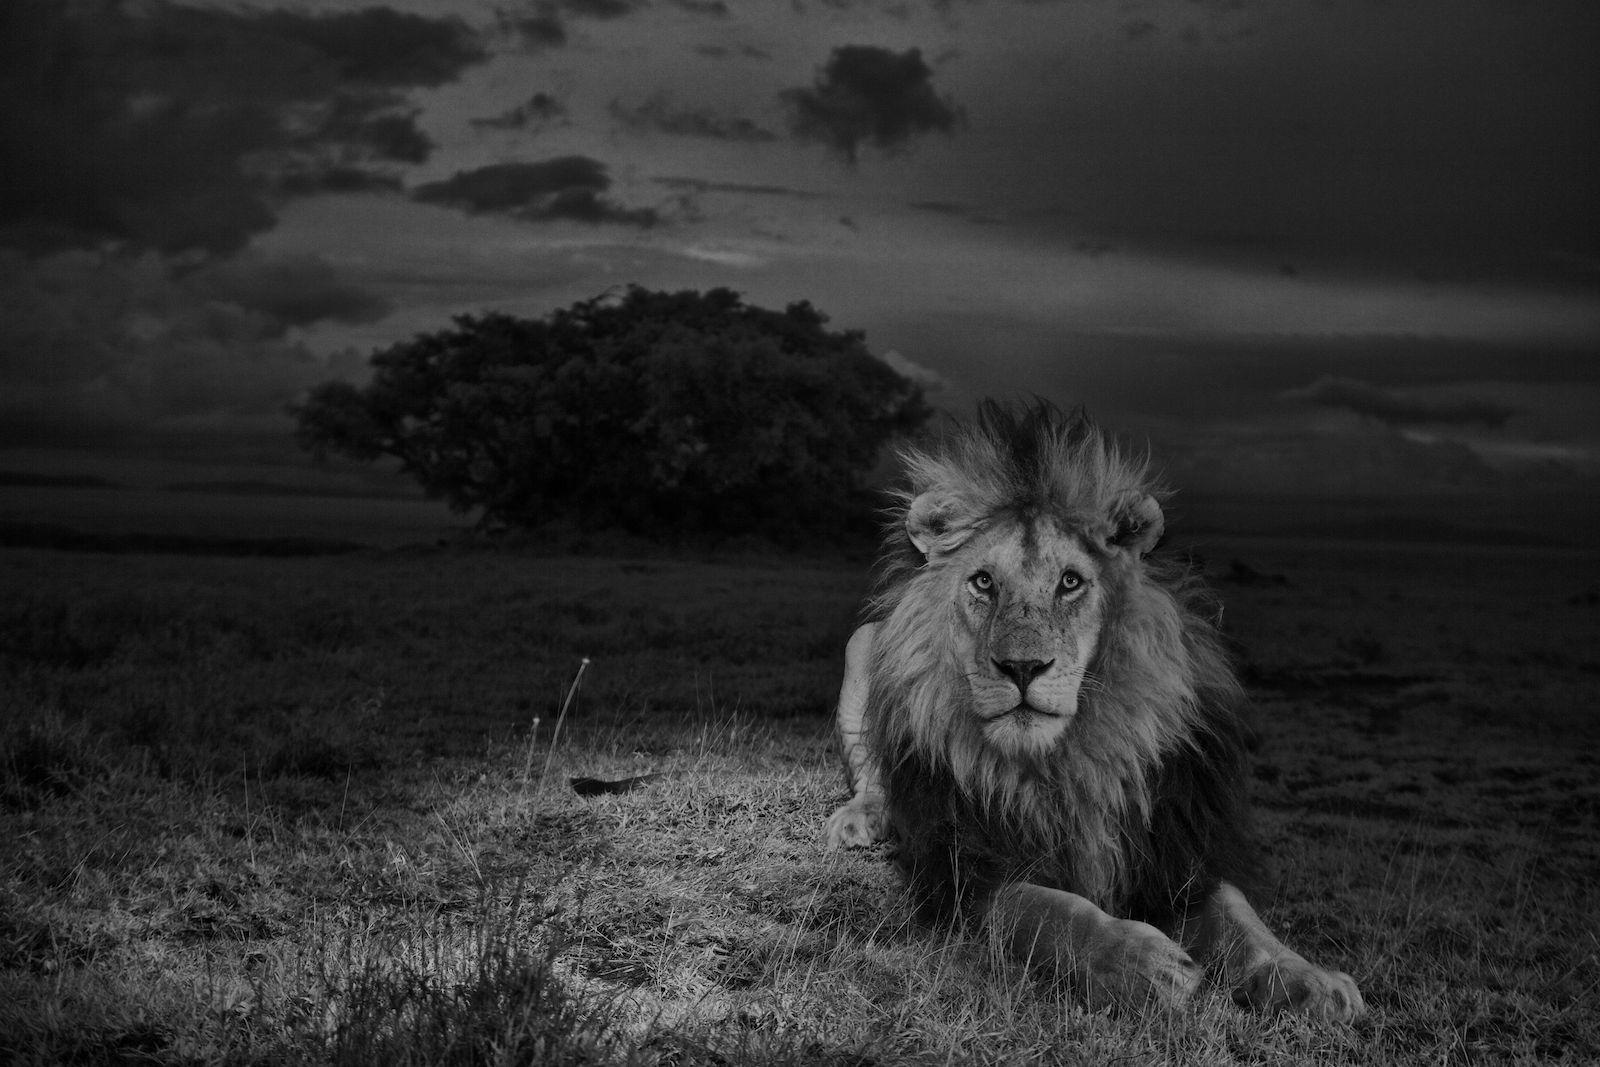 The serengeti lion lion king pinterest lion animals and male lion